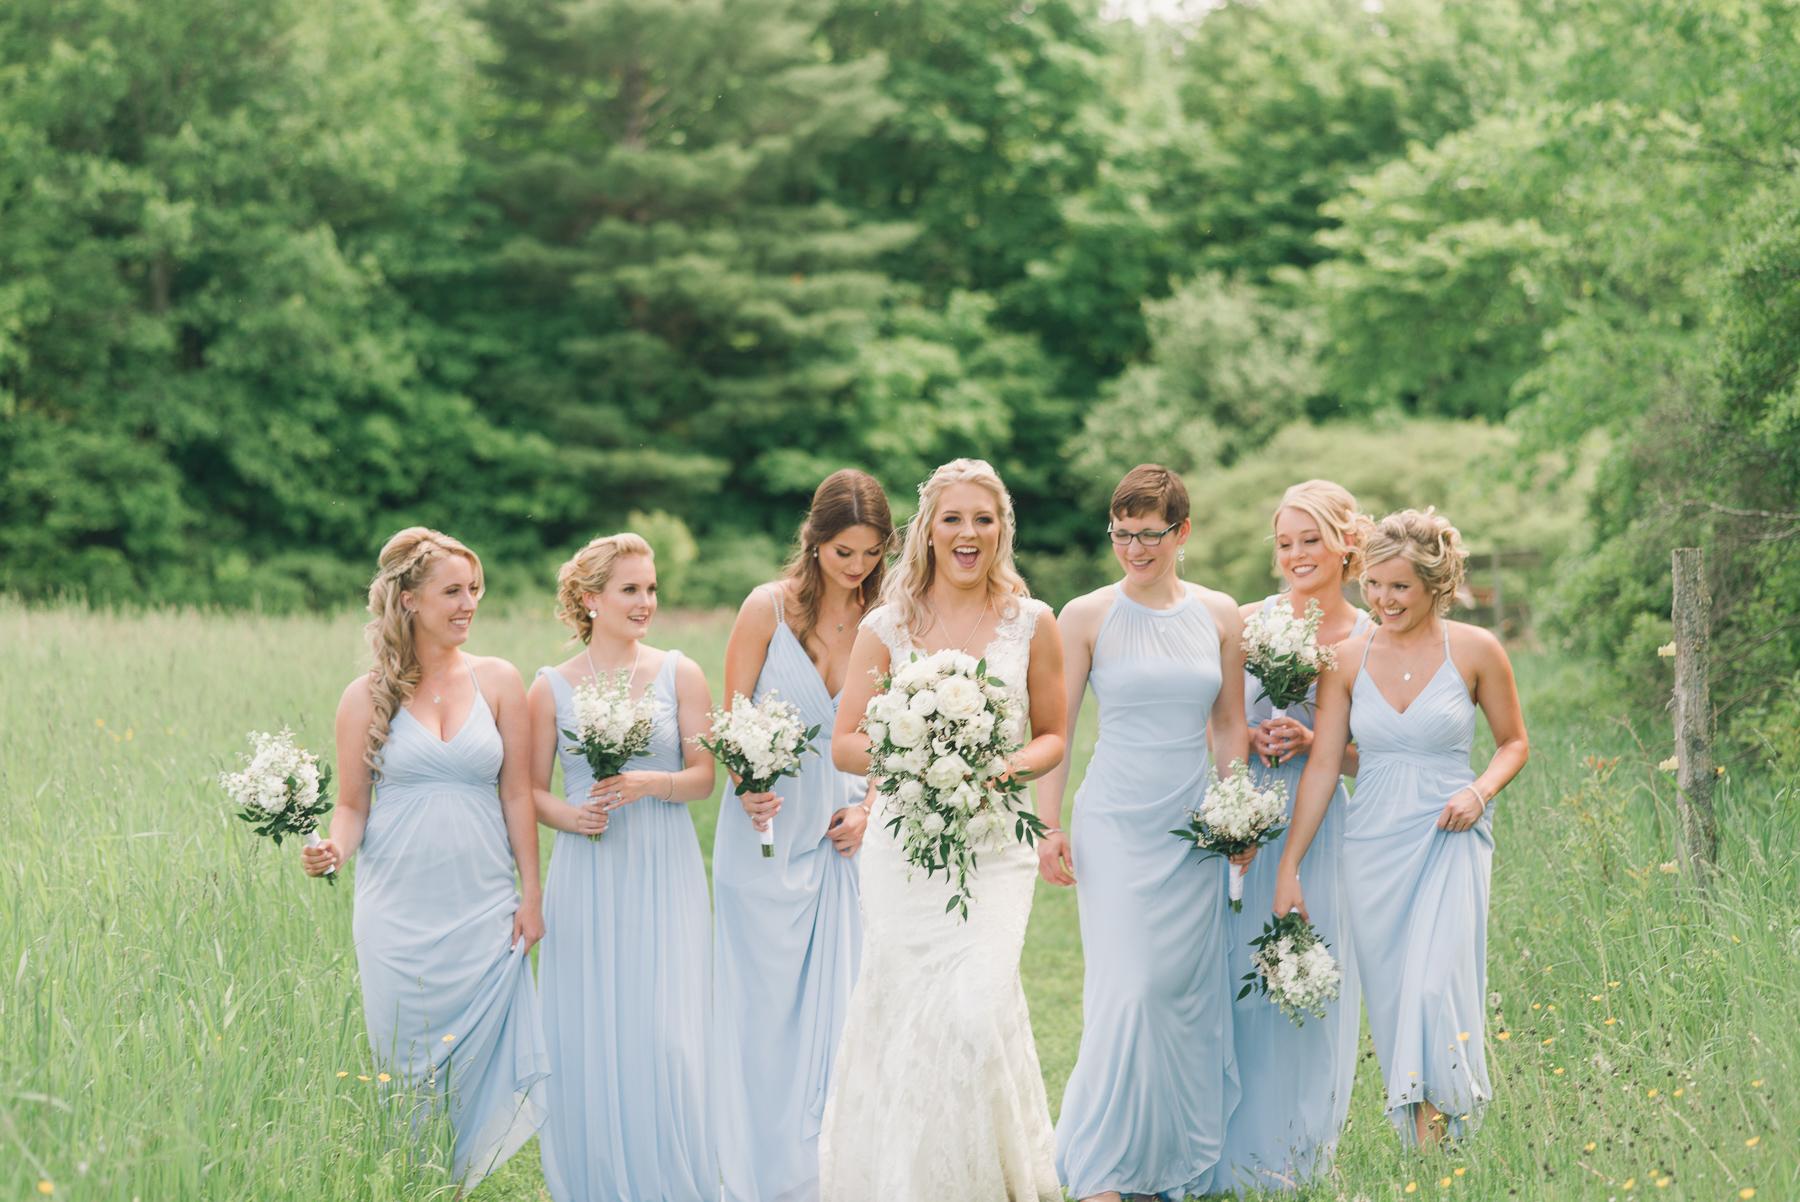 Kingston Wedding_Alabaster Jar Photography (19 of 42).jpg